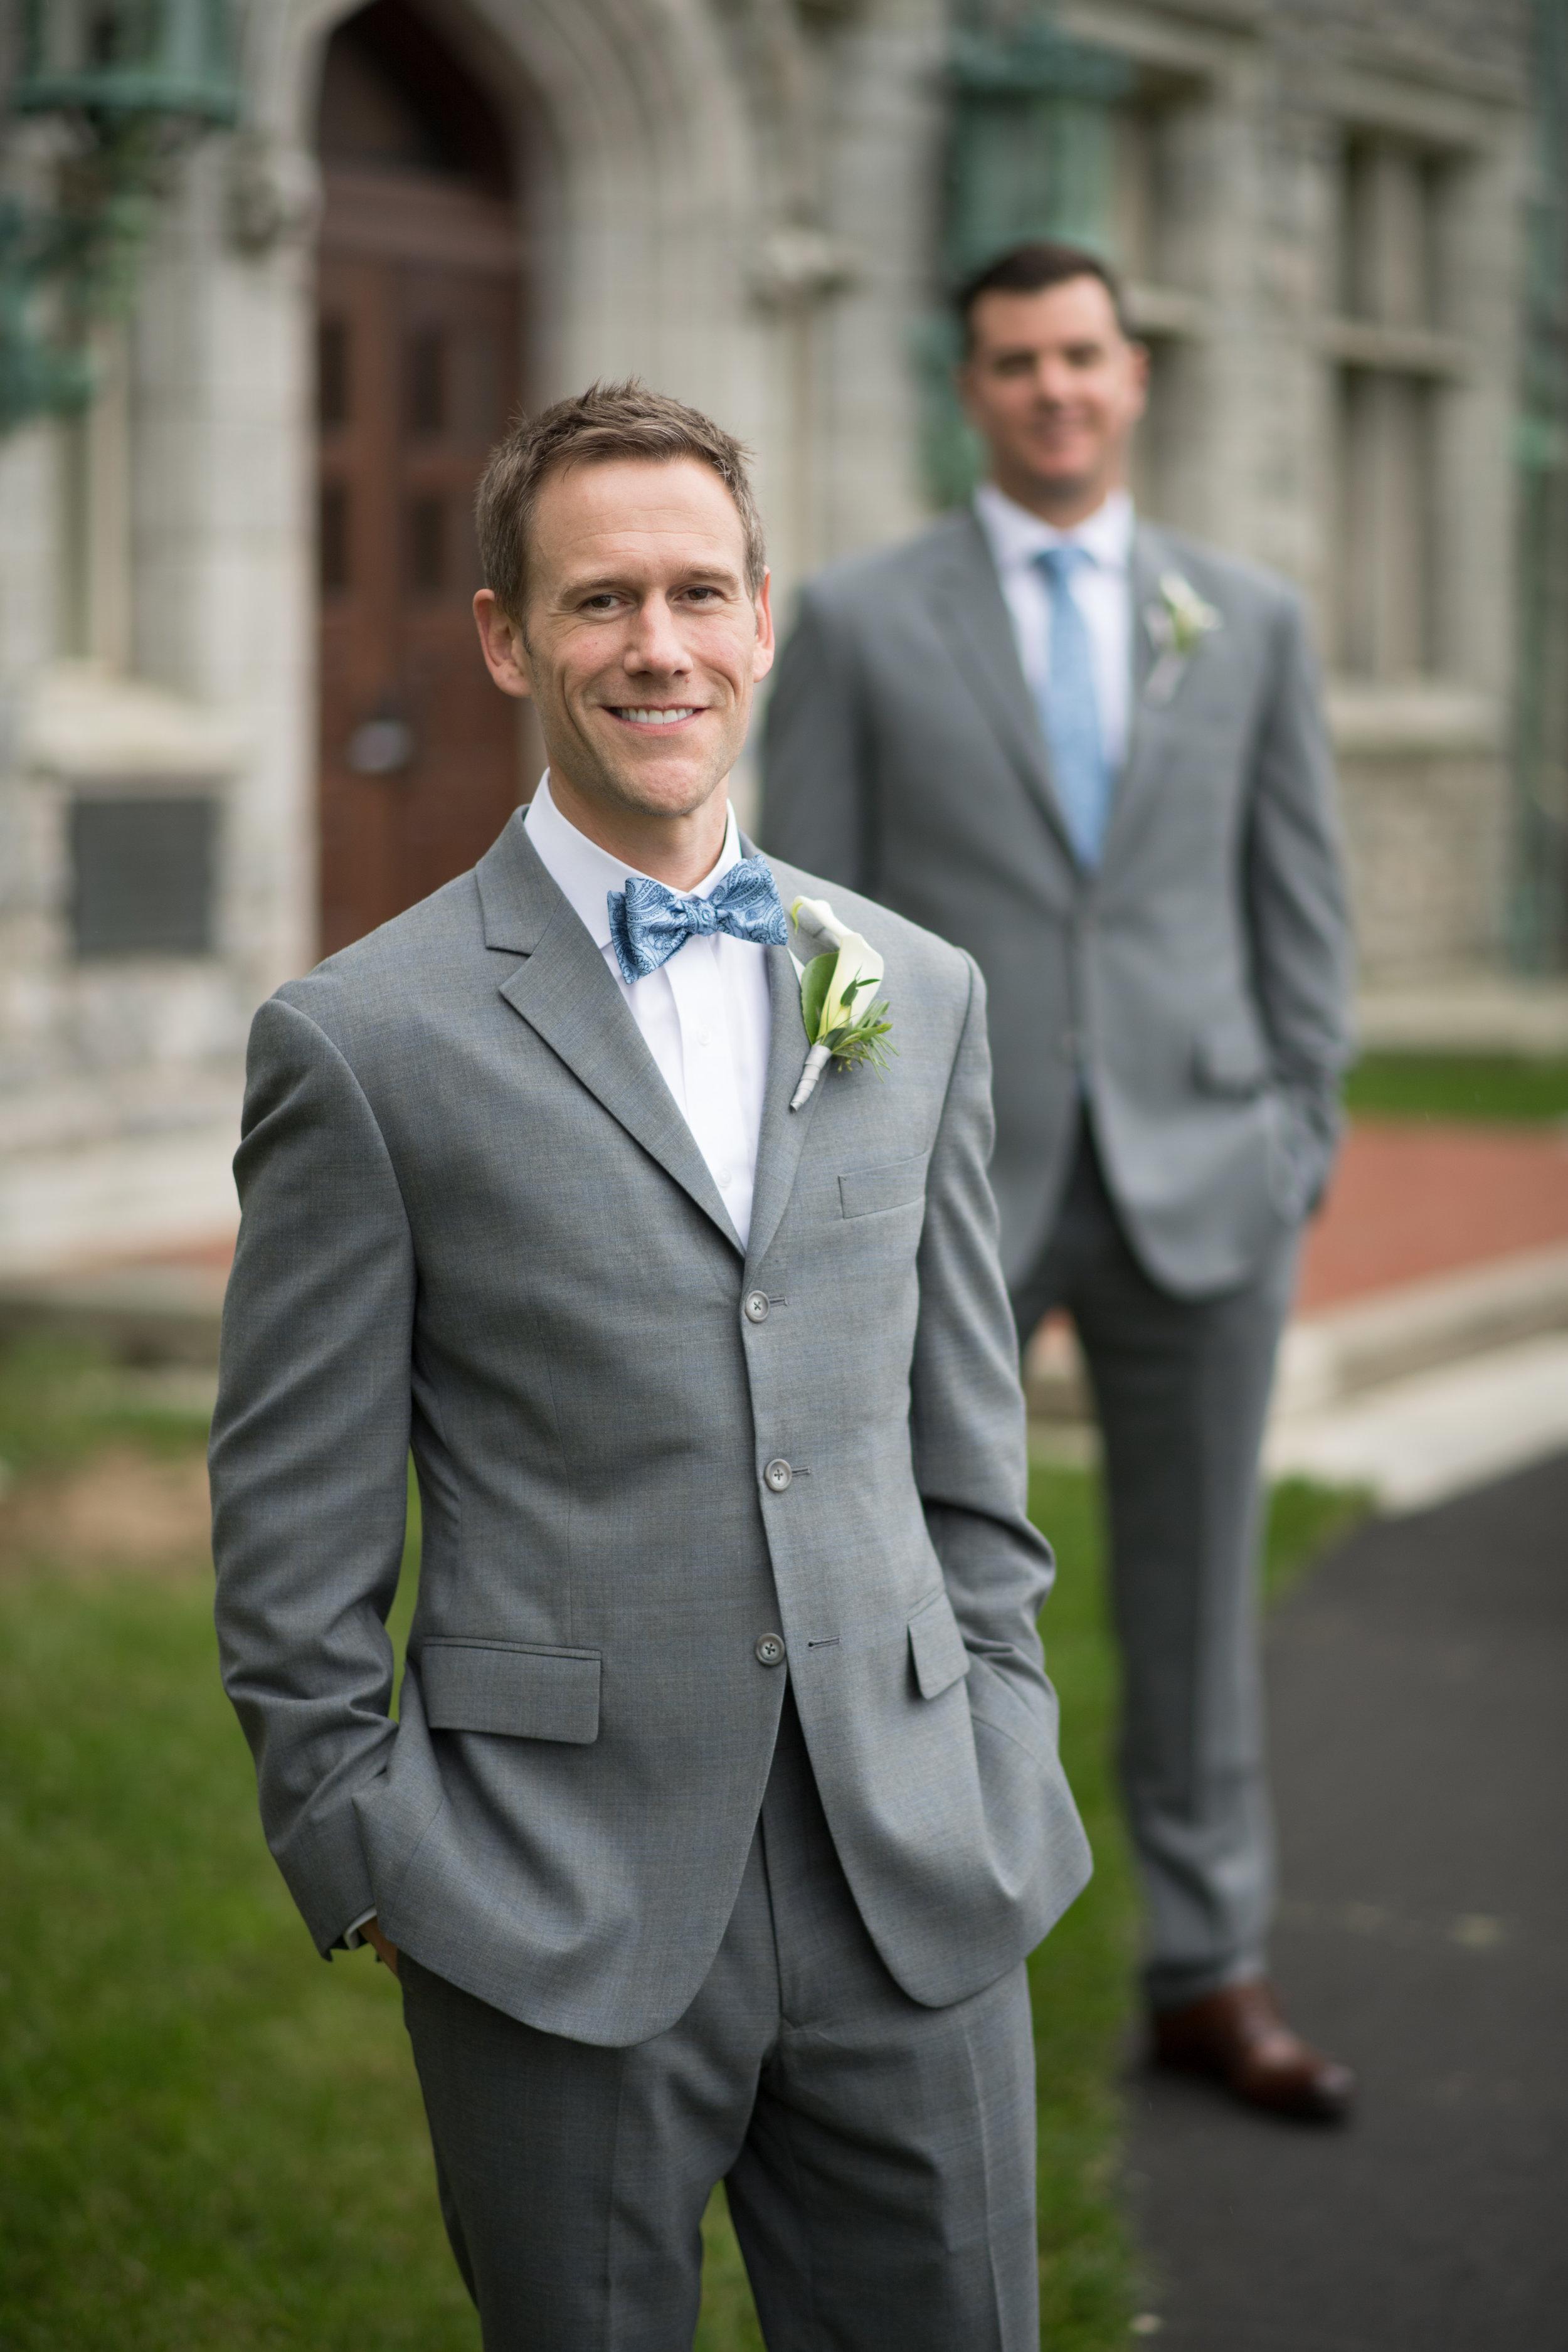 Same Sex Wedding Philadelphia Wedding PLanner LGBT Wedding005.jpg